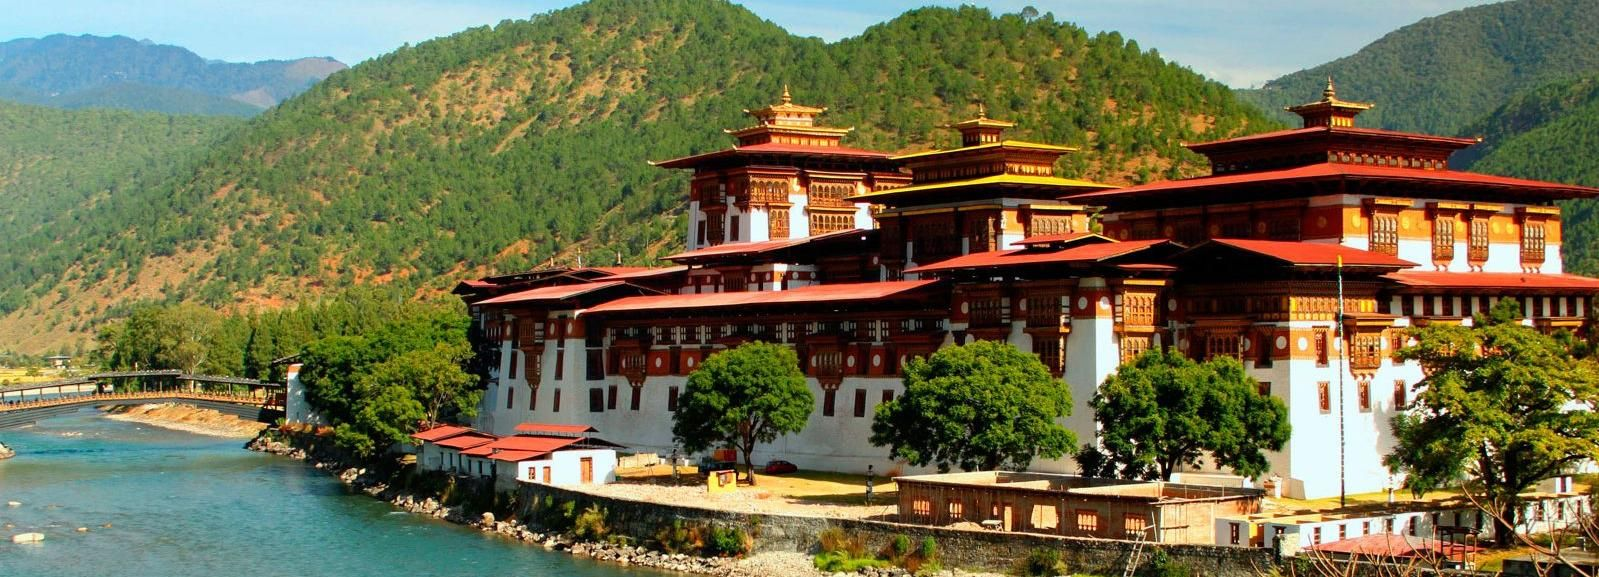 Kathmandu: 3-Day Bhutan Experience